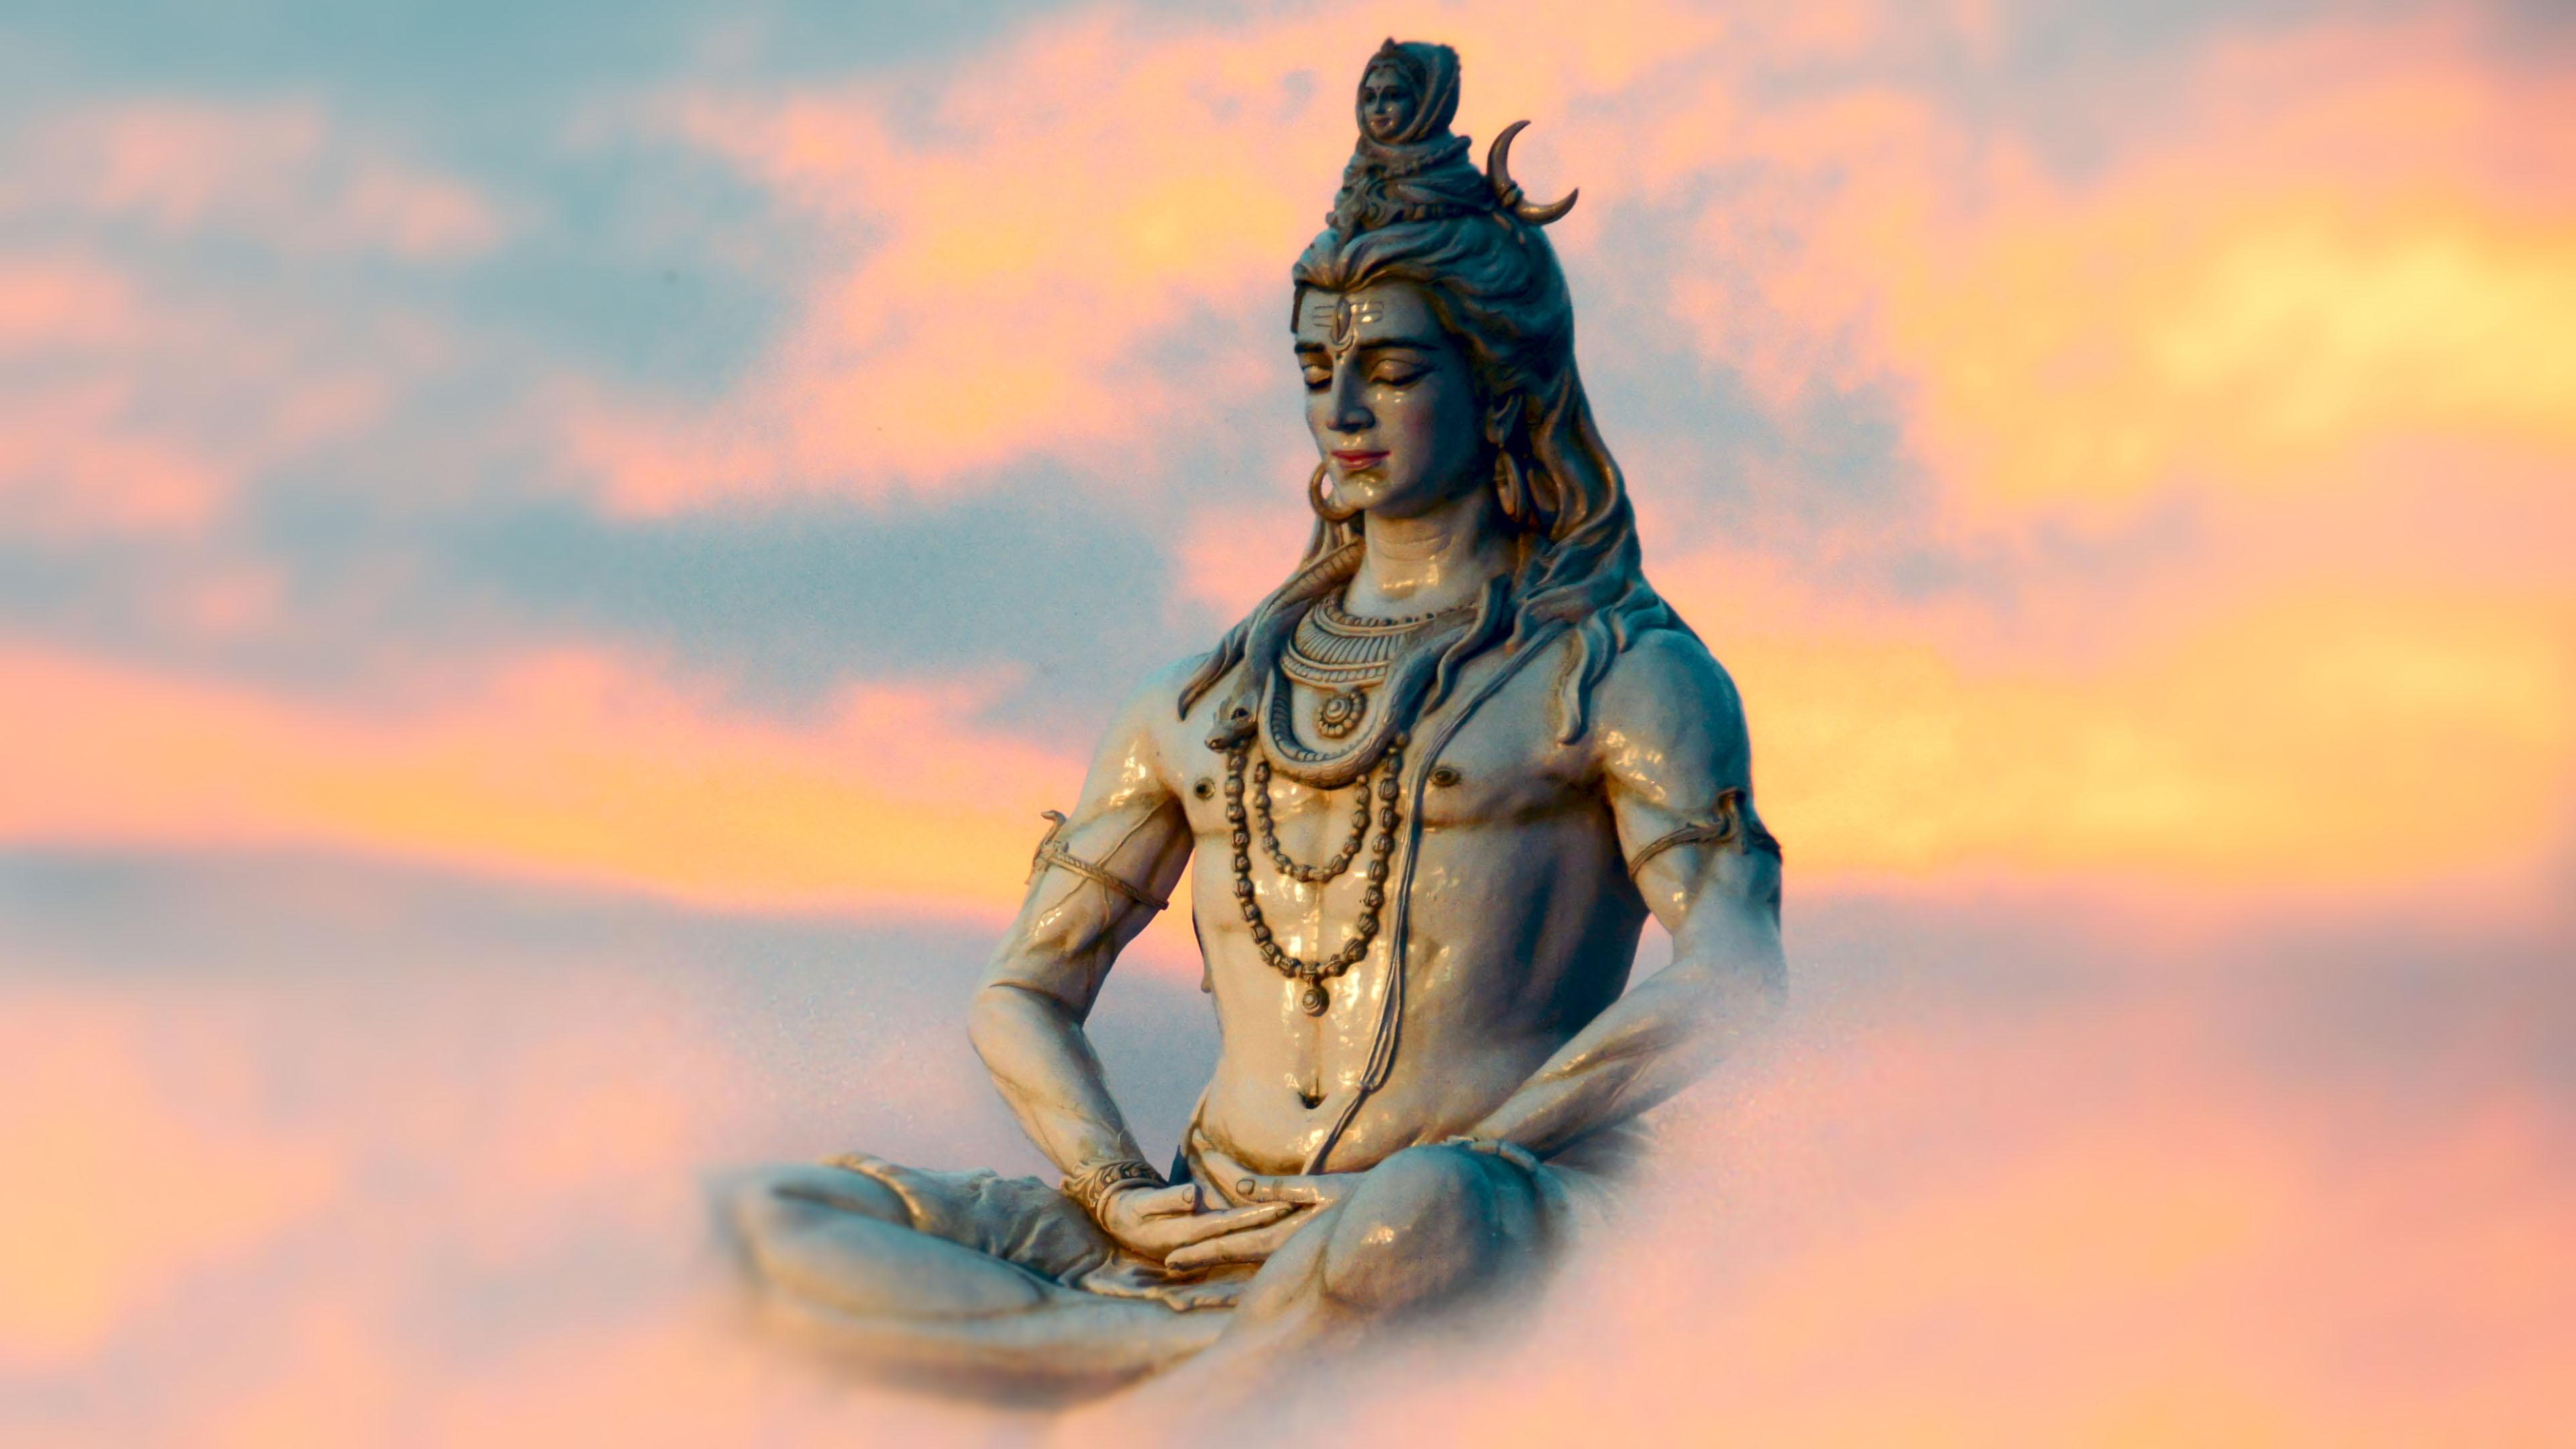 Shiva Yog Statue 4K Wallpaper